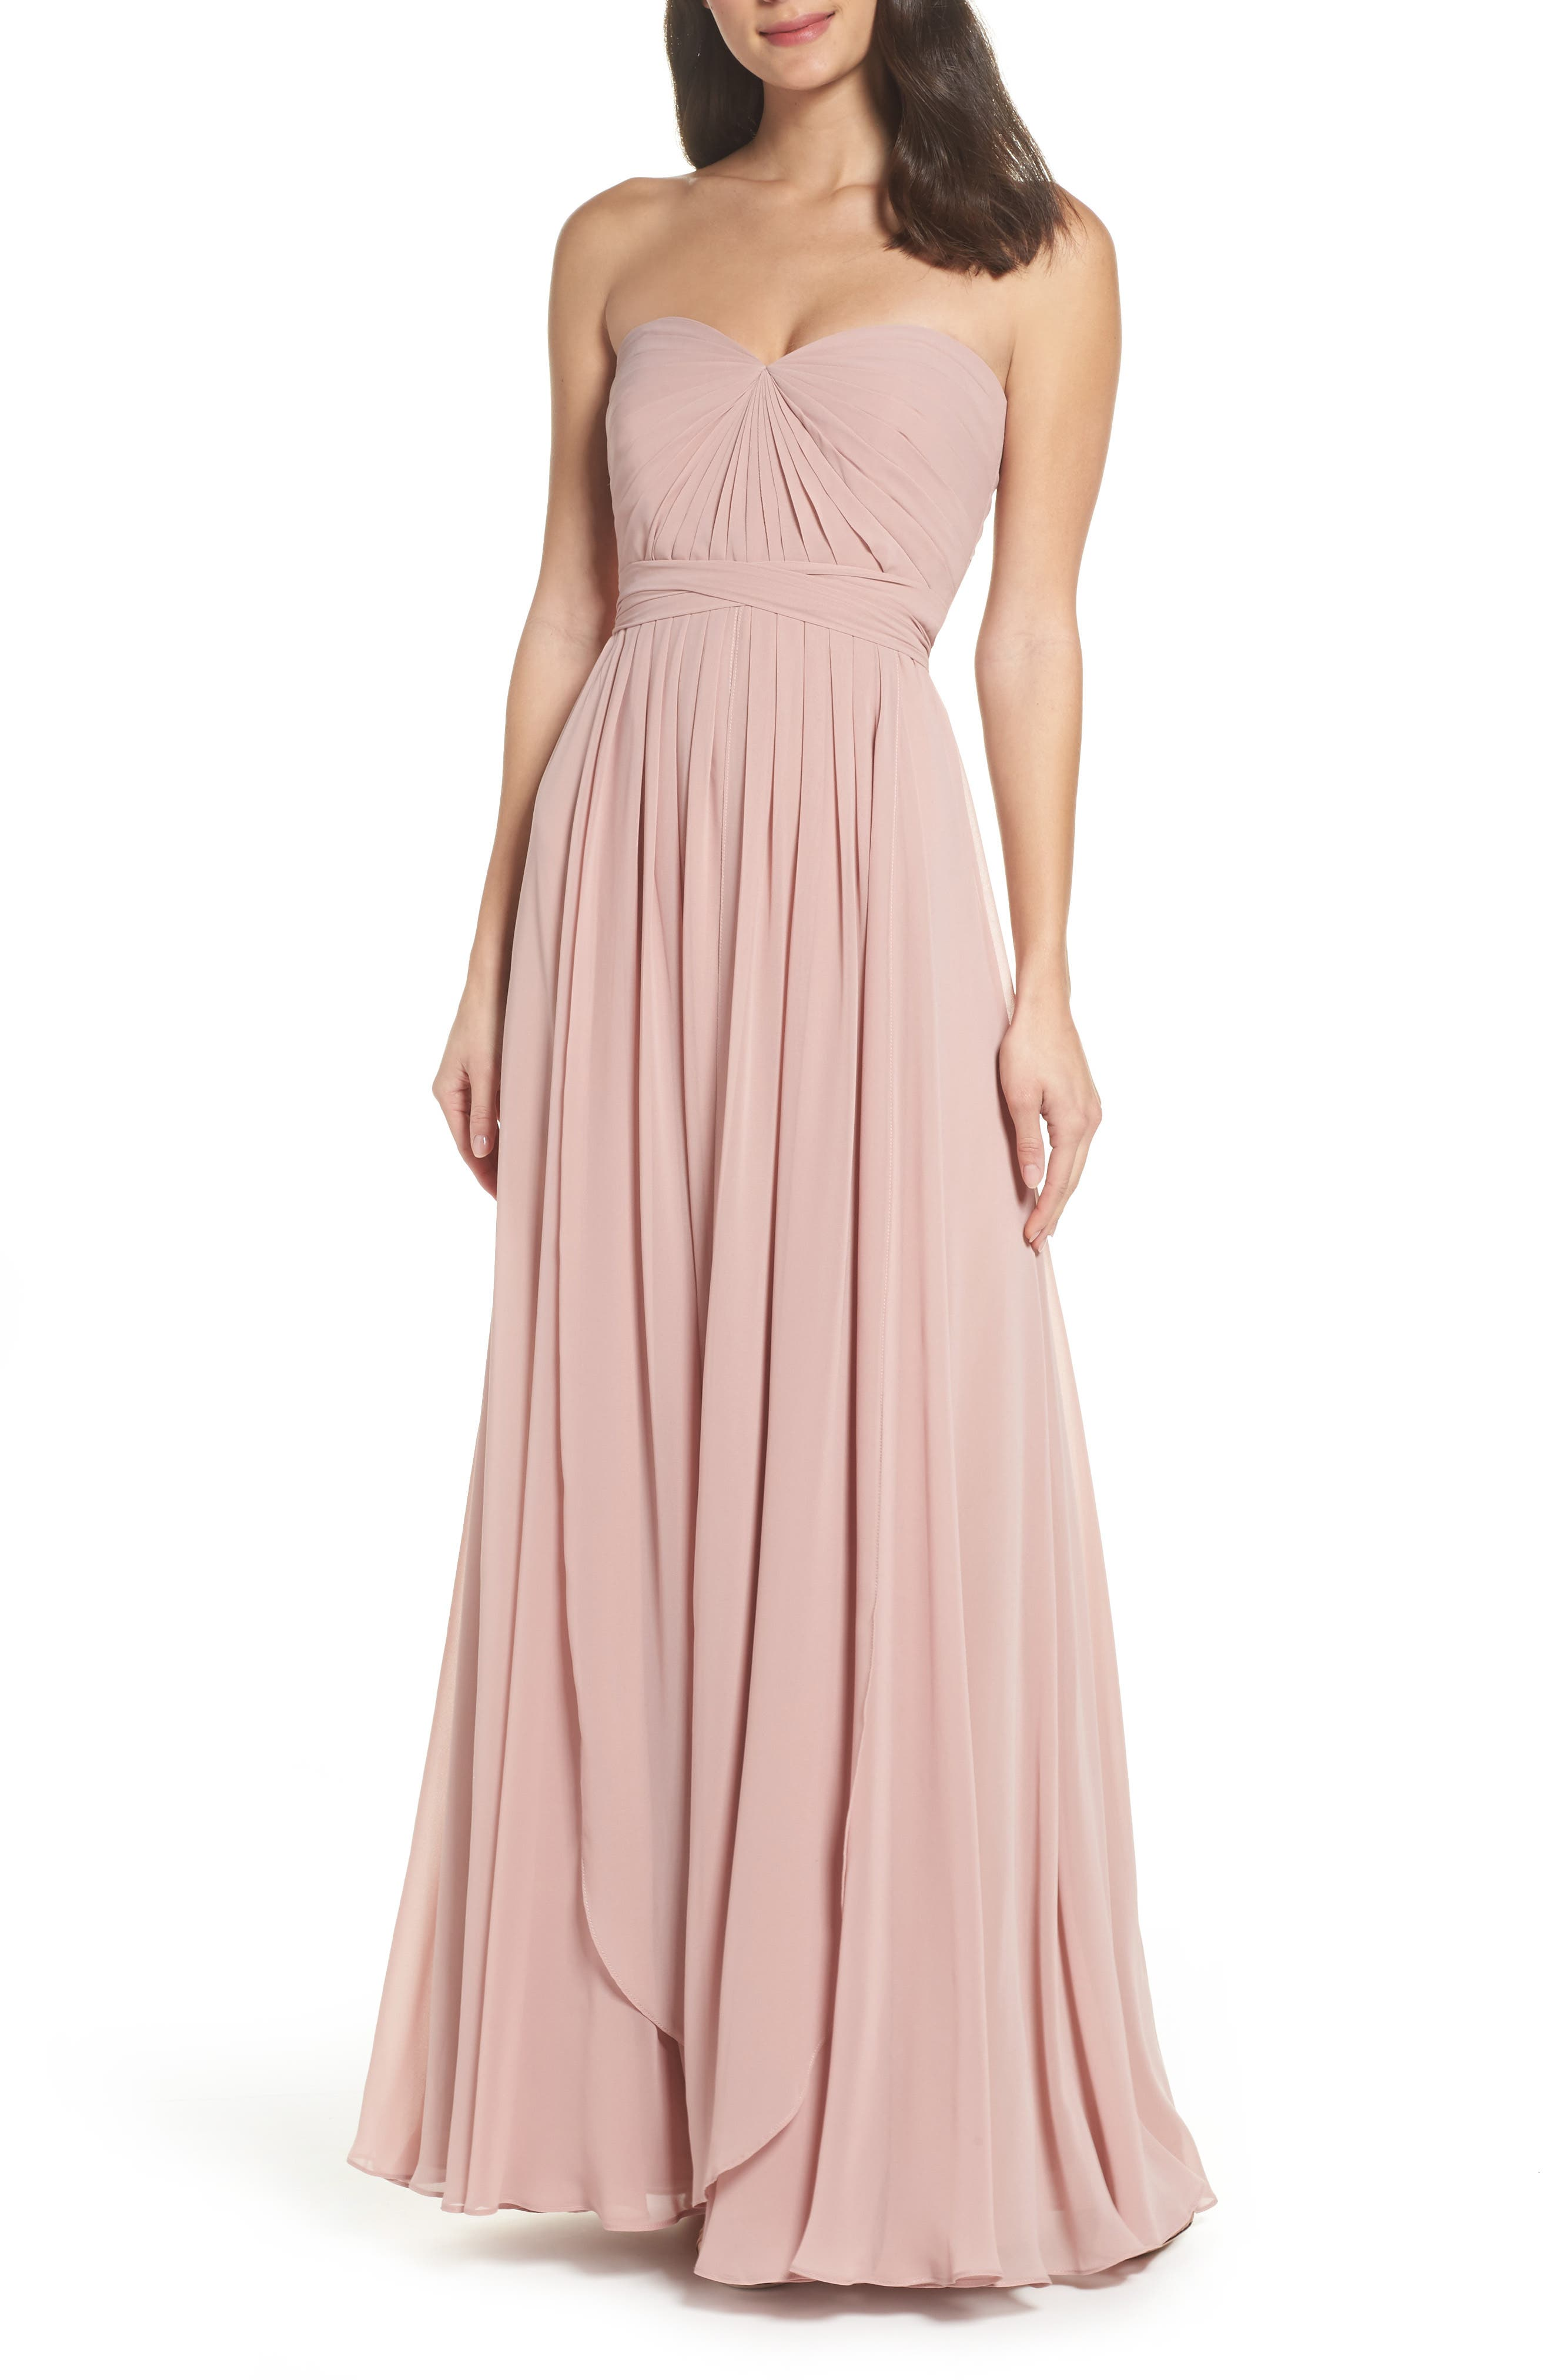 4b1d9beba0cc Jenny Yoo Mira Convertible Strapless Chiffon Gown In Whipped Apricot ...